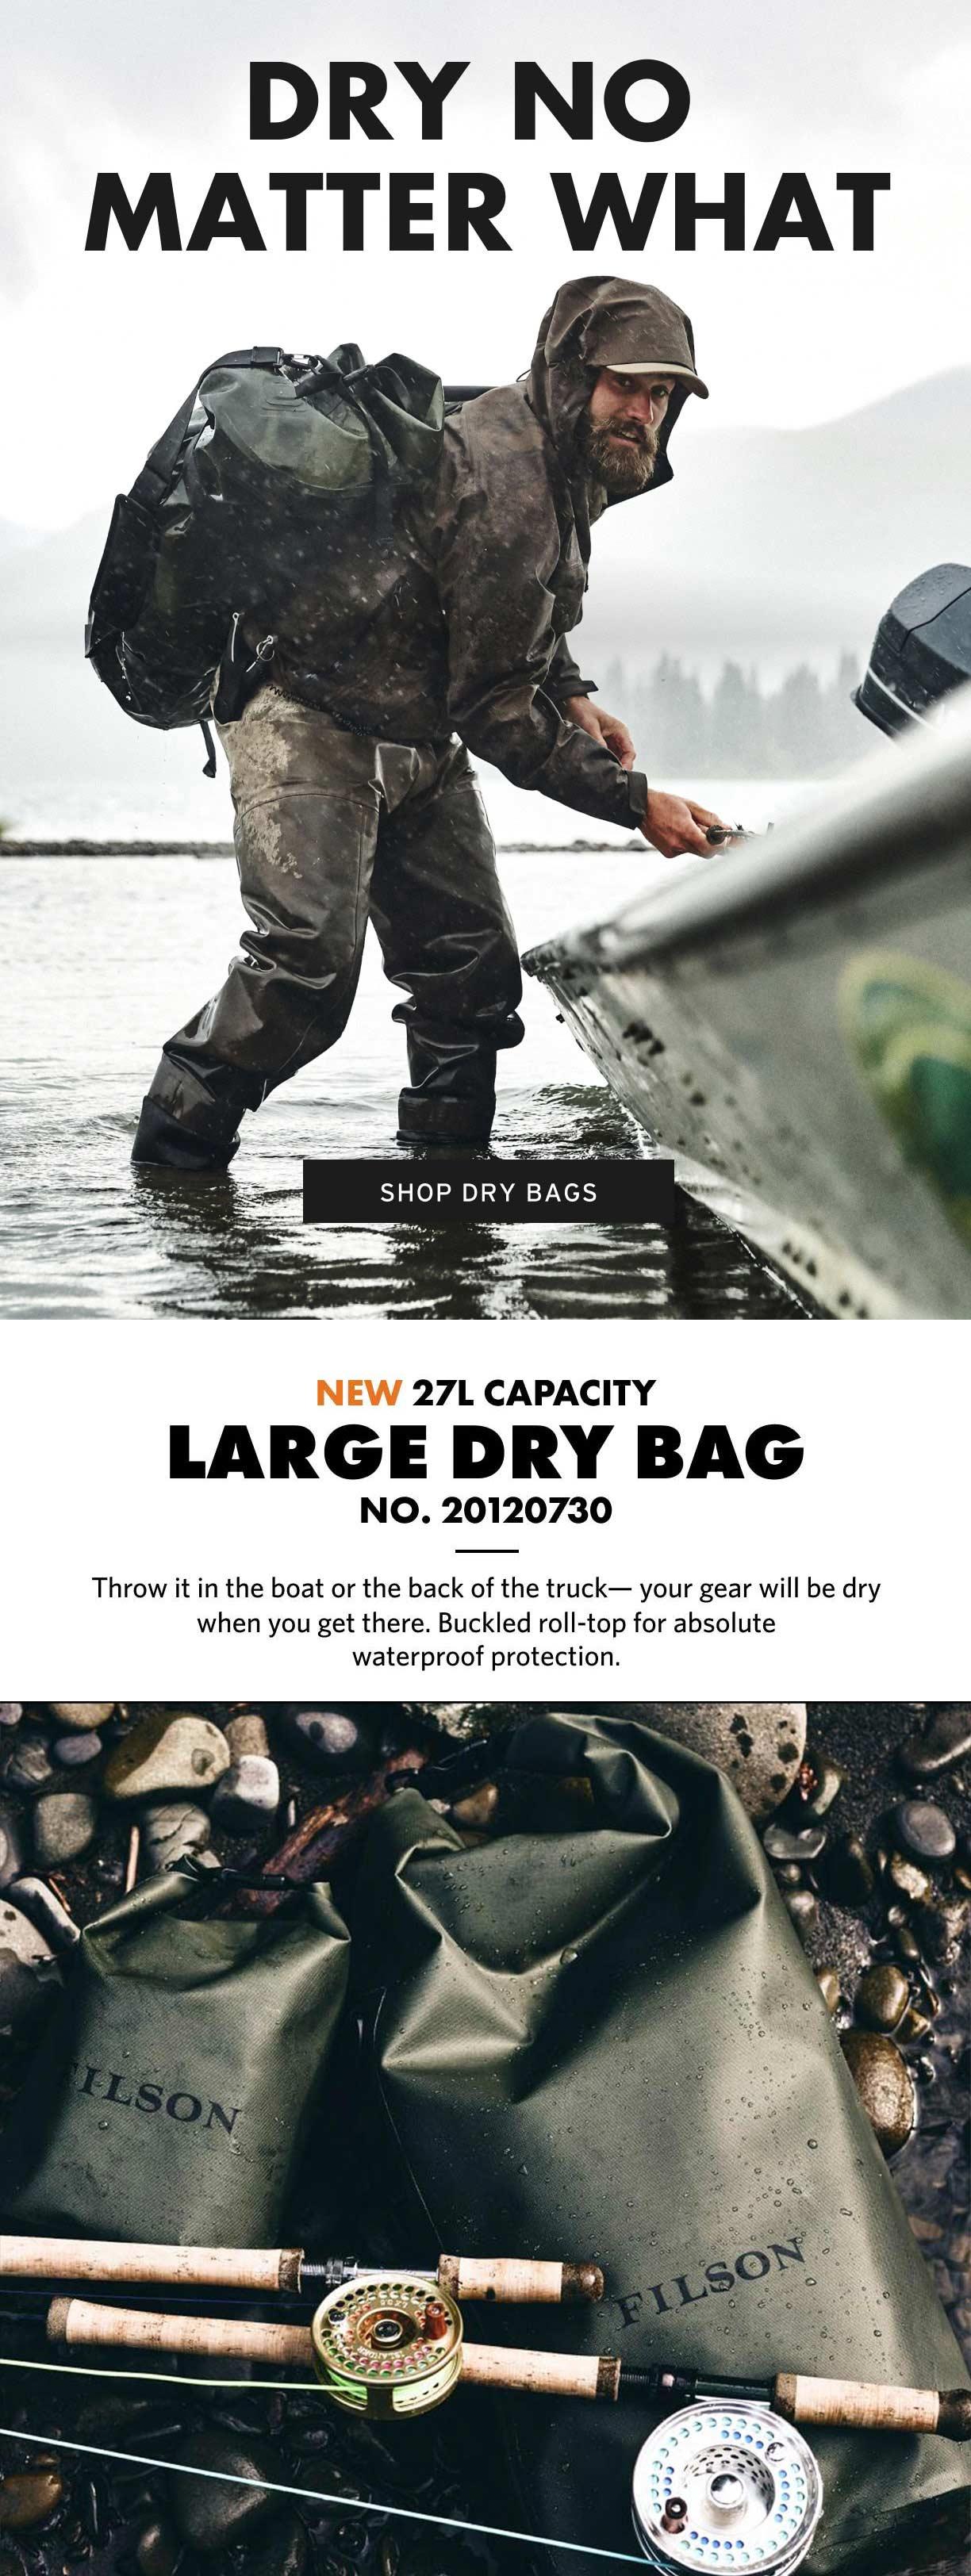 Filson Dry Bag Large Productinformation